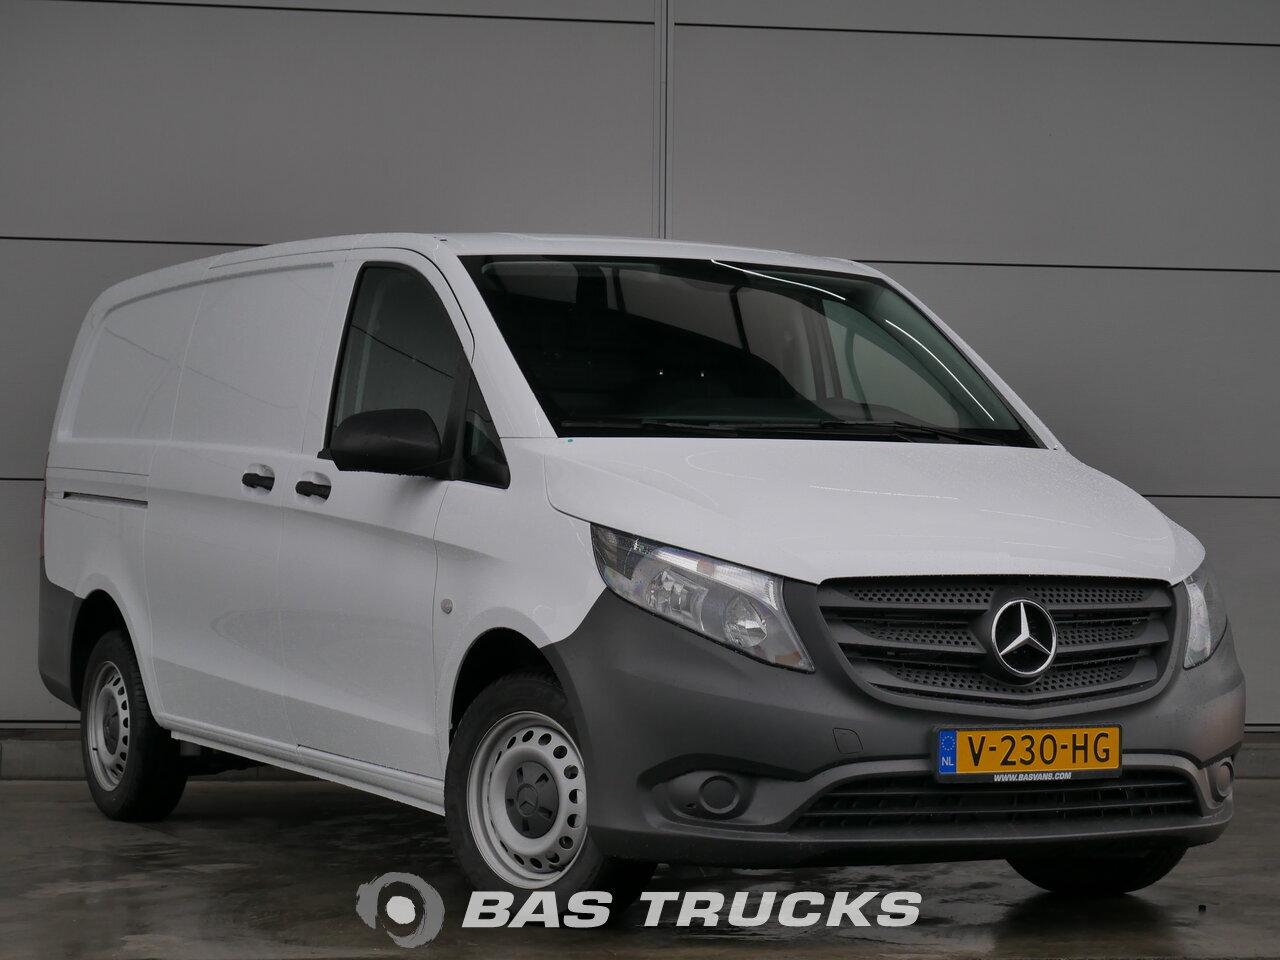 mercedes vito light commercial vehicle euro norm 0 17400 bas vans. Black Bedroom Furniture Sets. Home Design Ideas